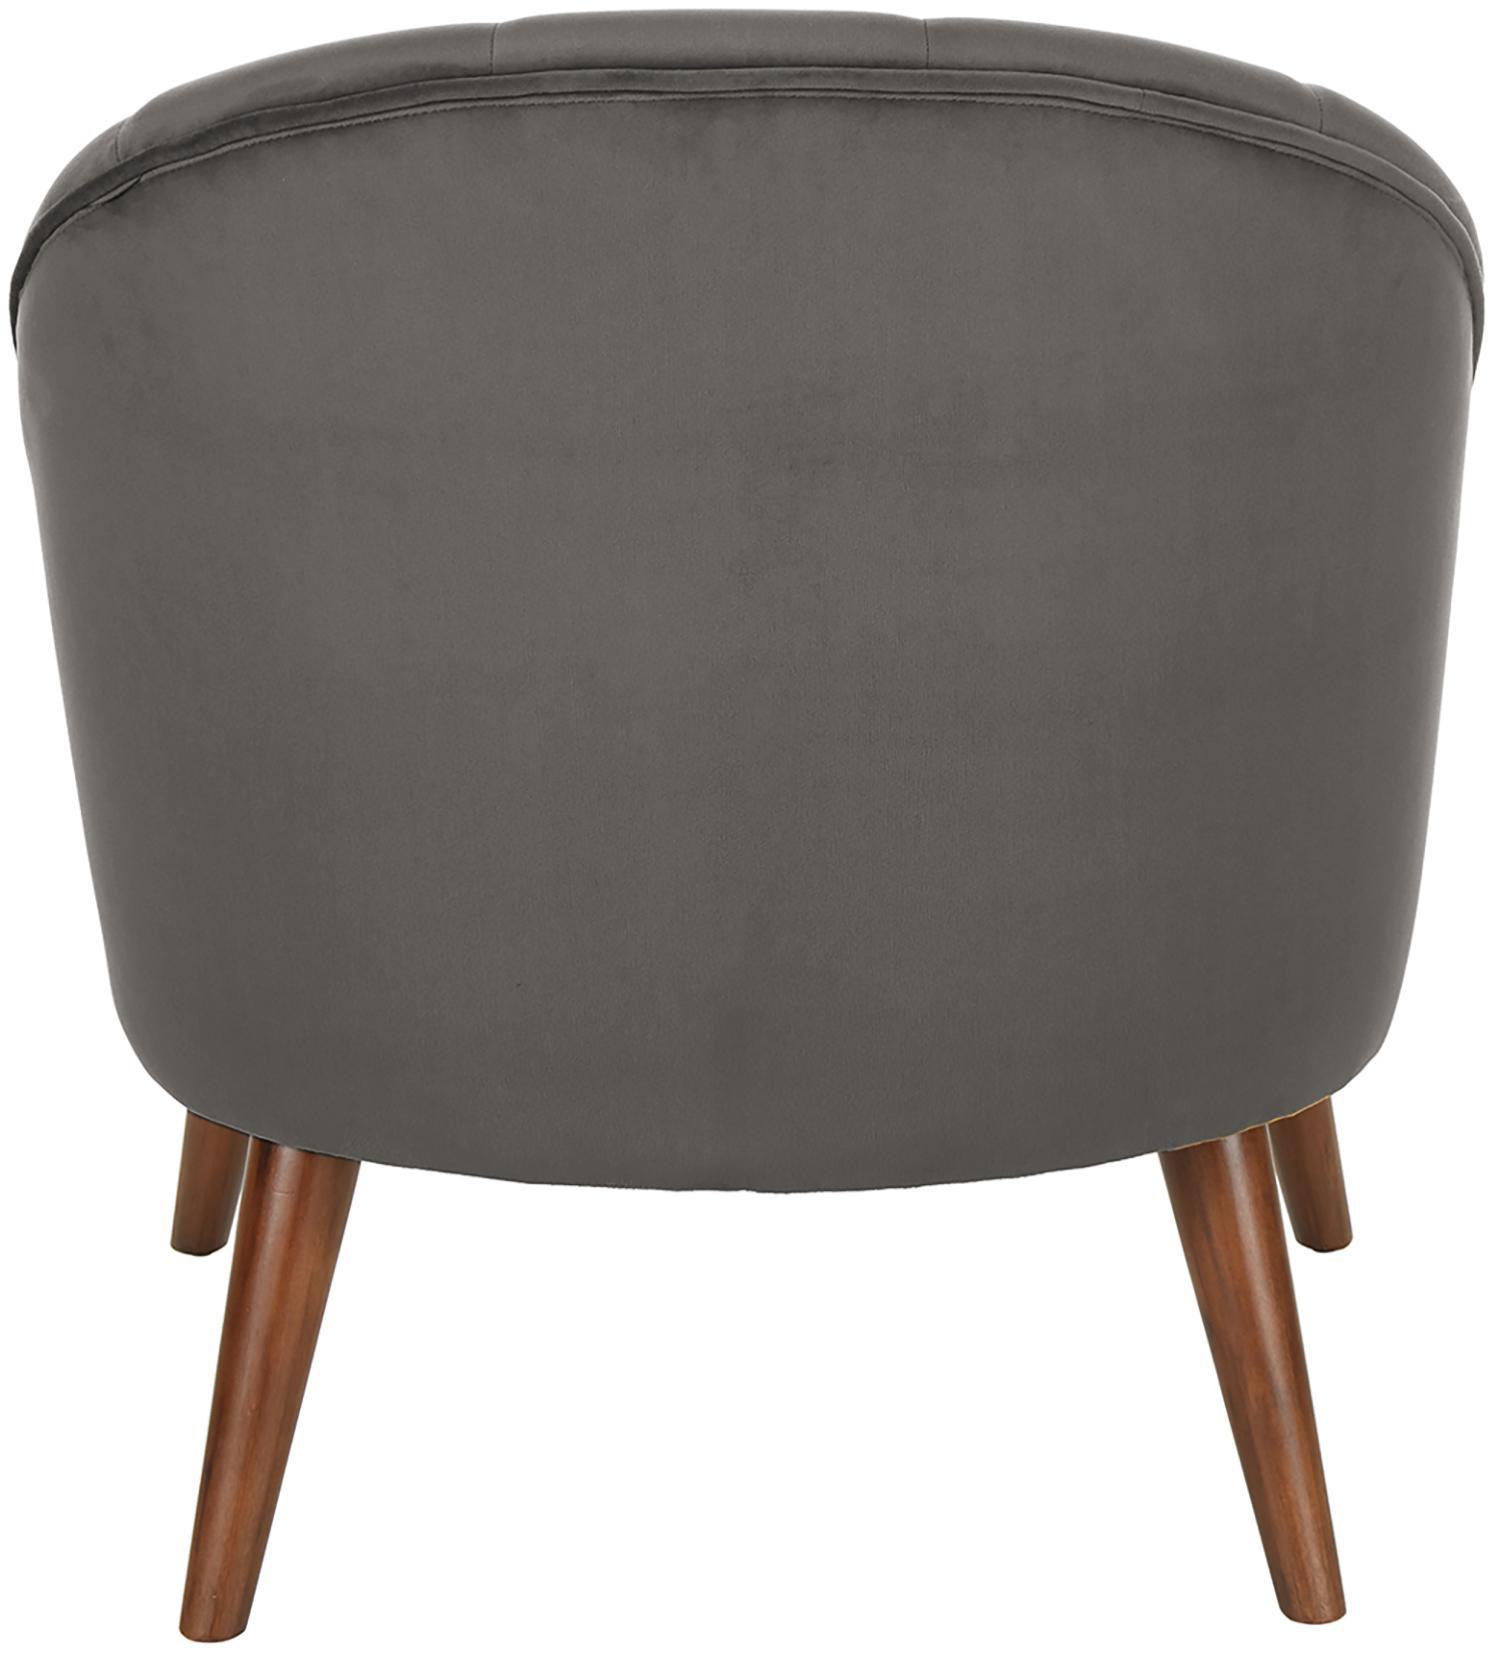 Samt-Cocktailsessel Aya, Bezug: Samt (Polyester) 30.000 S, Füße: Birkenholz, lackiert, Samt Dunkelgrau, B 73 x T 64 cm